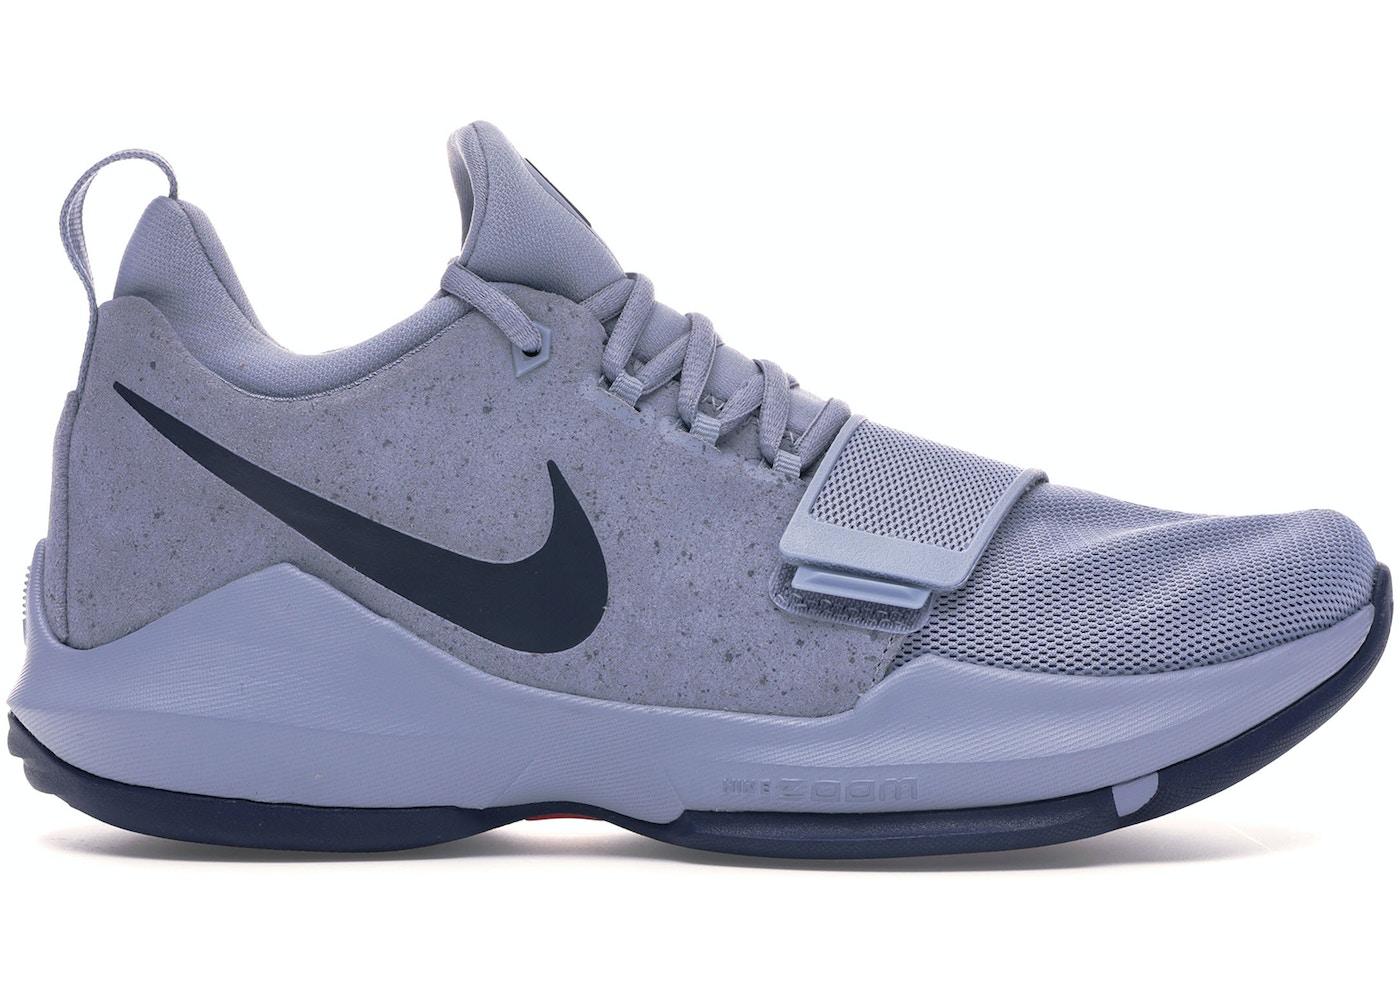 separation shoes e3a0a 1961a Nike PG 1 Glacier Grey